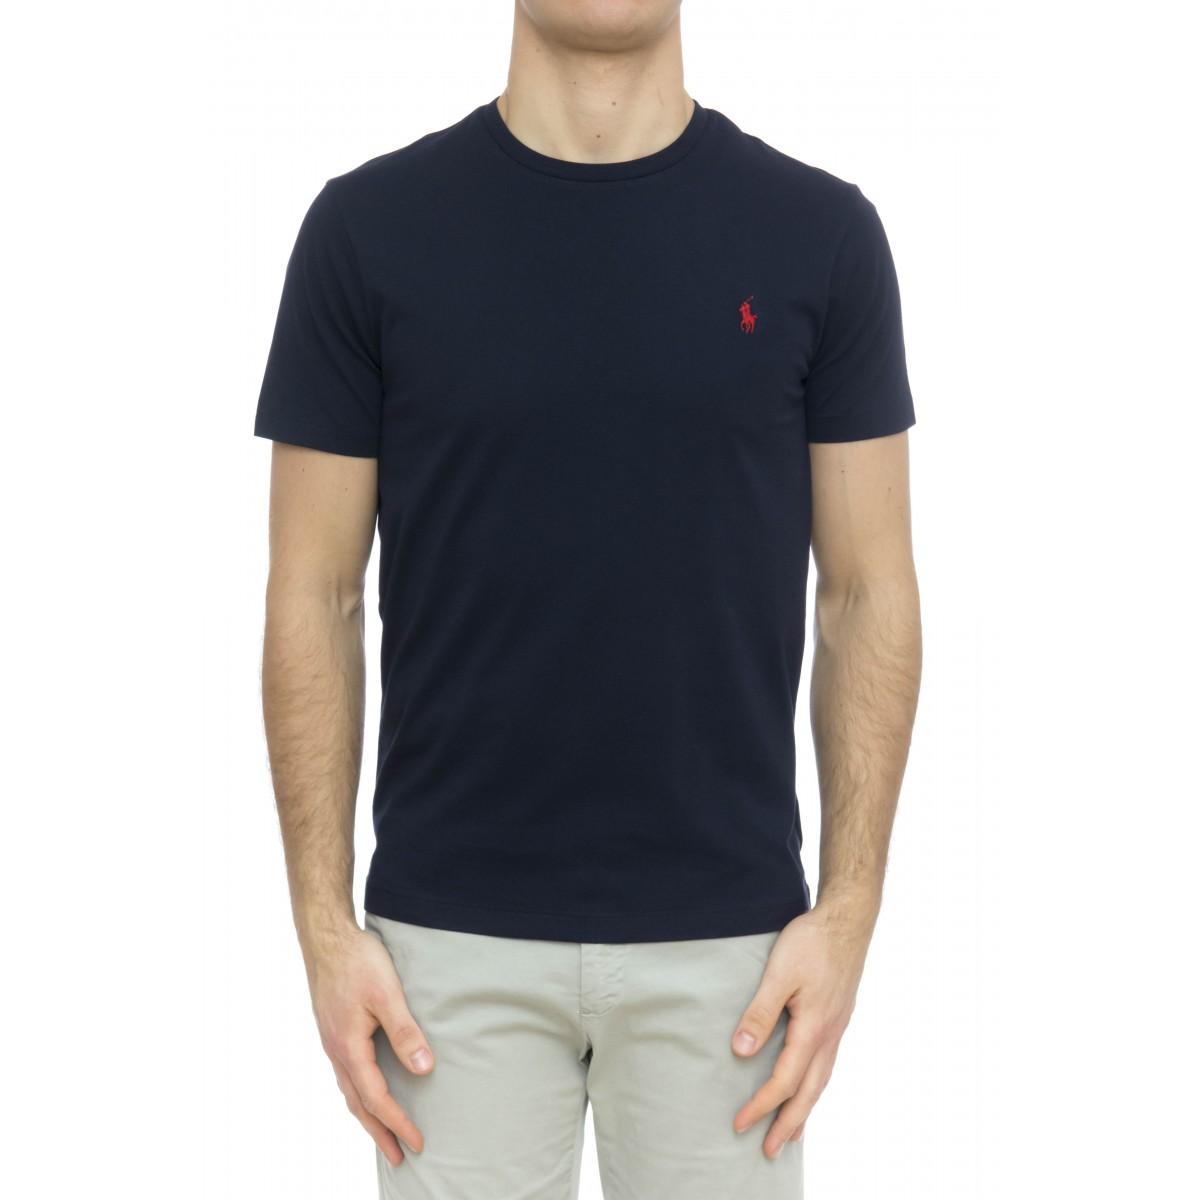 T-shirt uomo - 680785 t-shirt logo